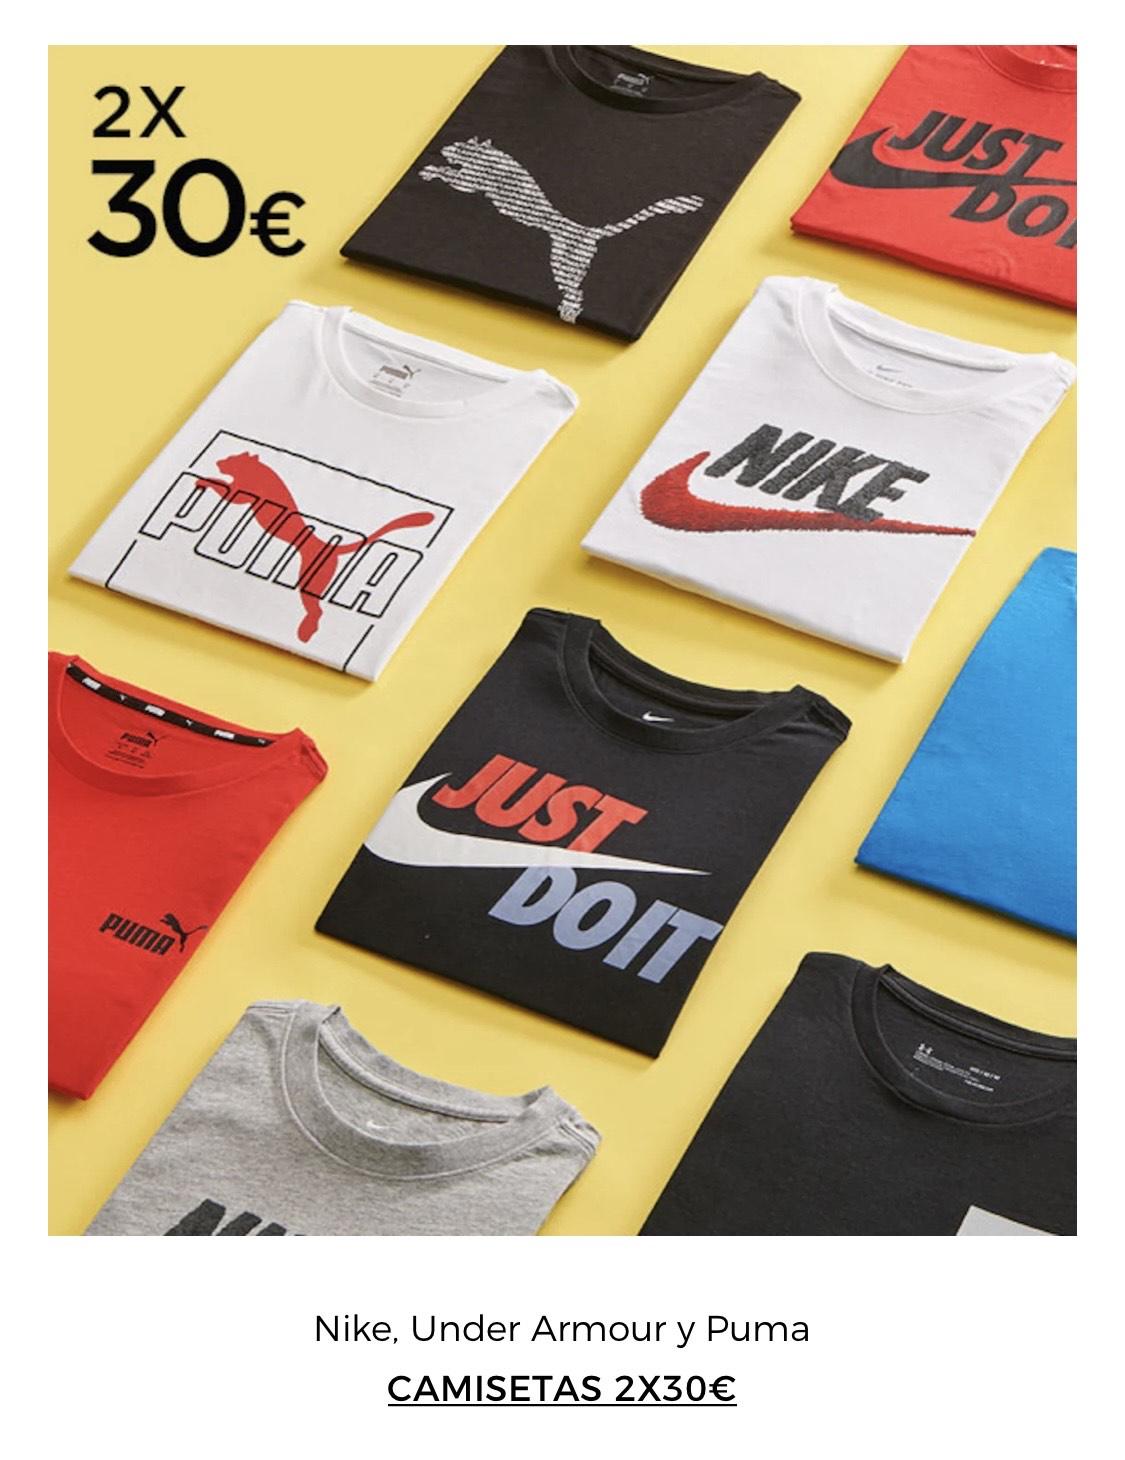 Camisetas 2X30€ 8 Días De Oro Ropa Deportiva